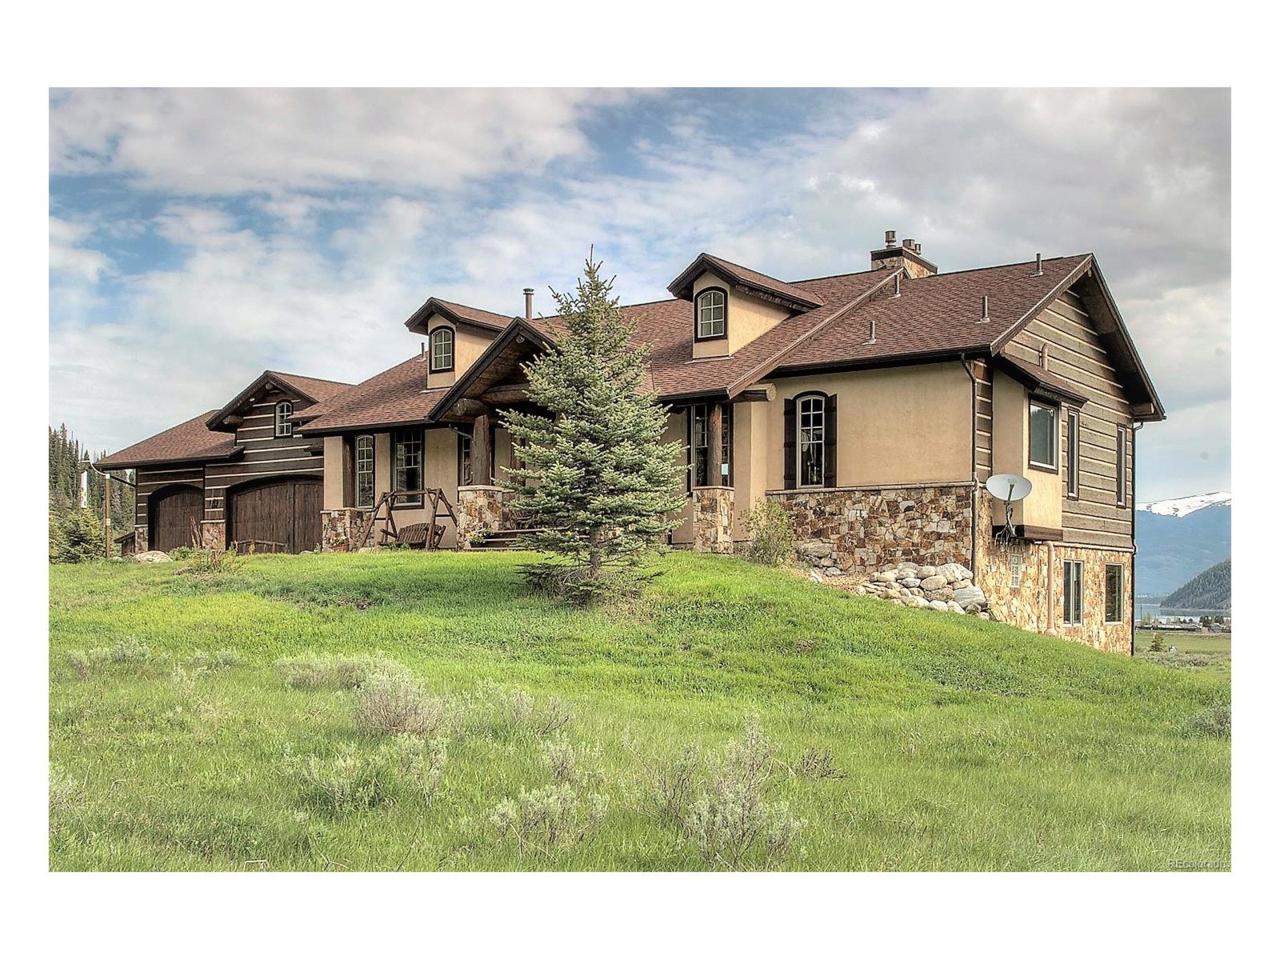 81 Alpensee Court, Breckenridge, CO 80424 (MLS #2819767) :: 8z Real Estate